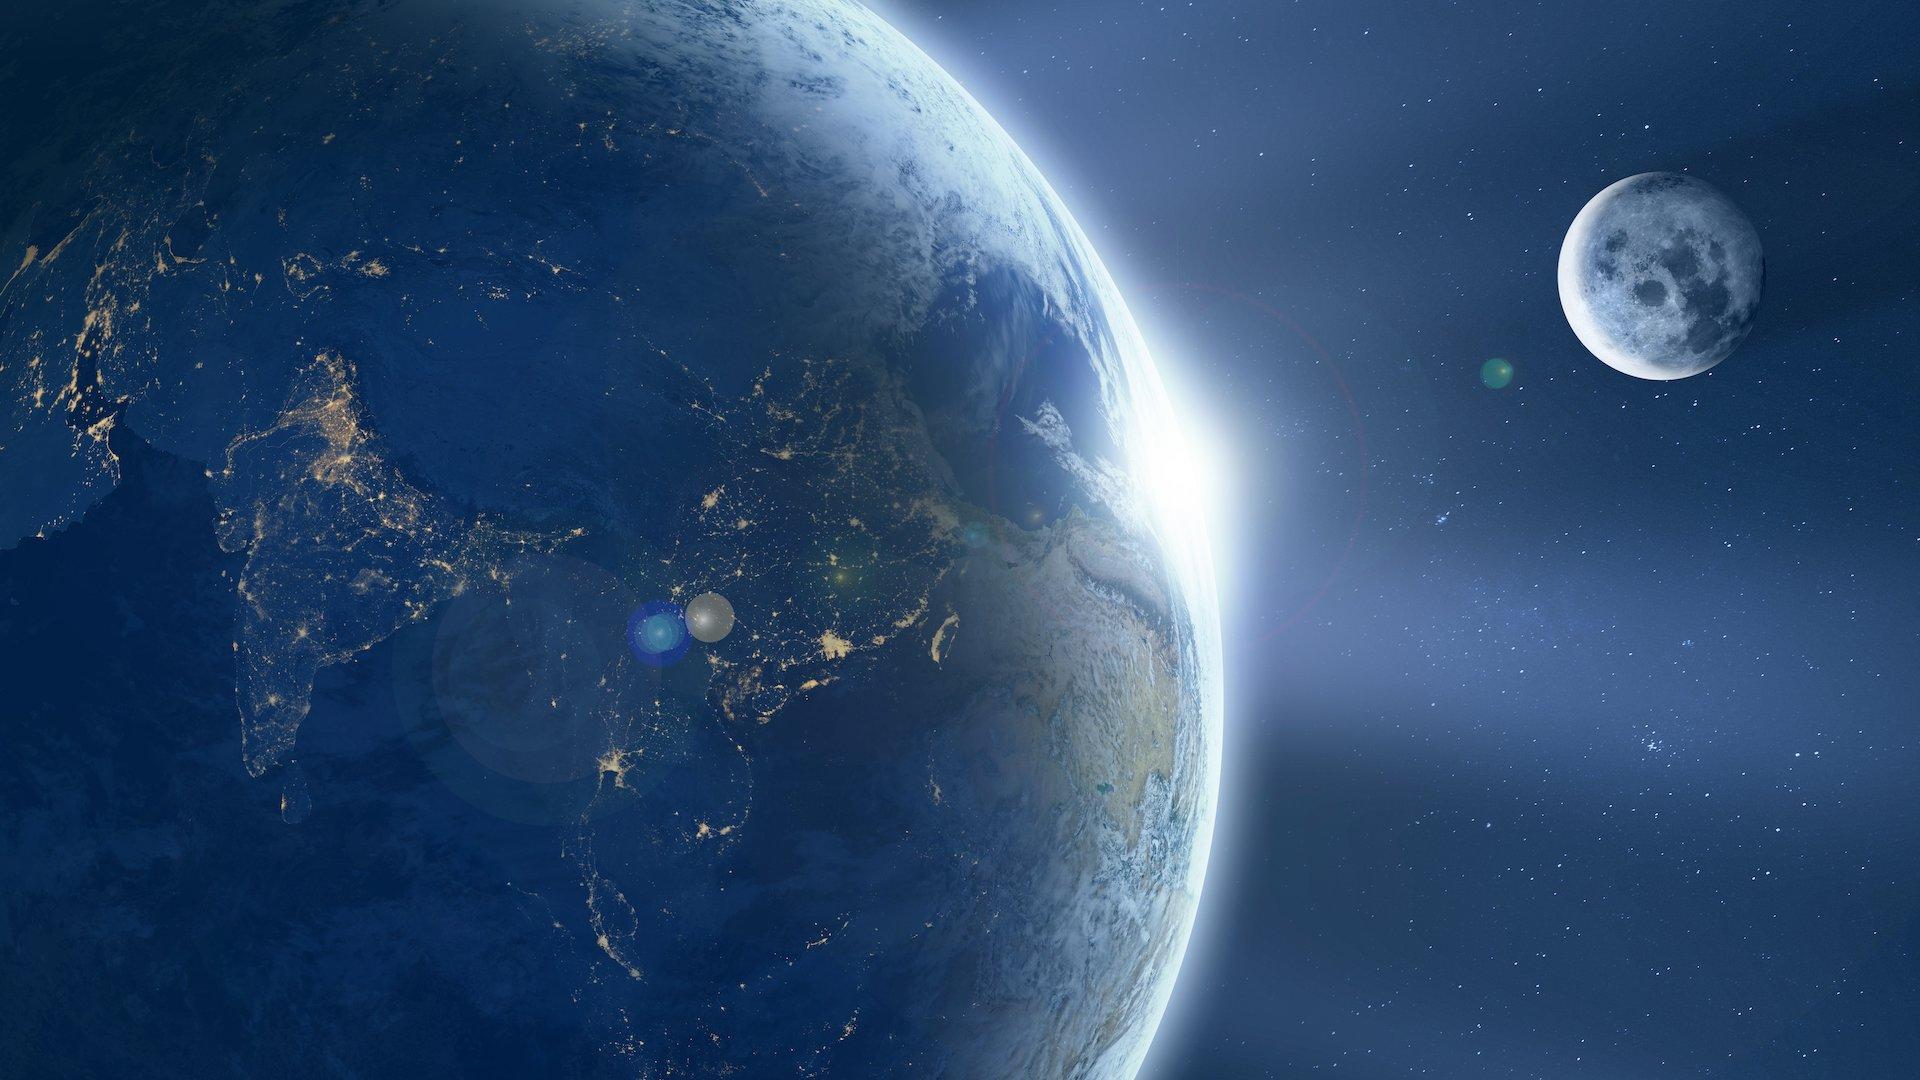 Welt Mond Weltraum